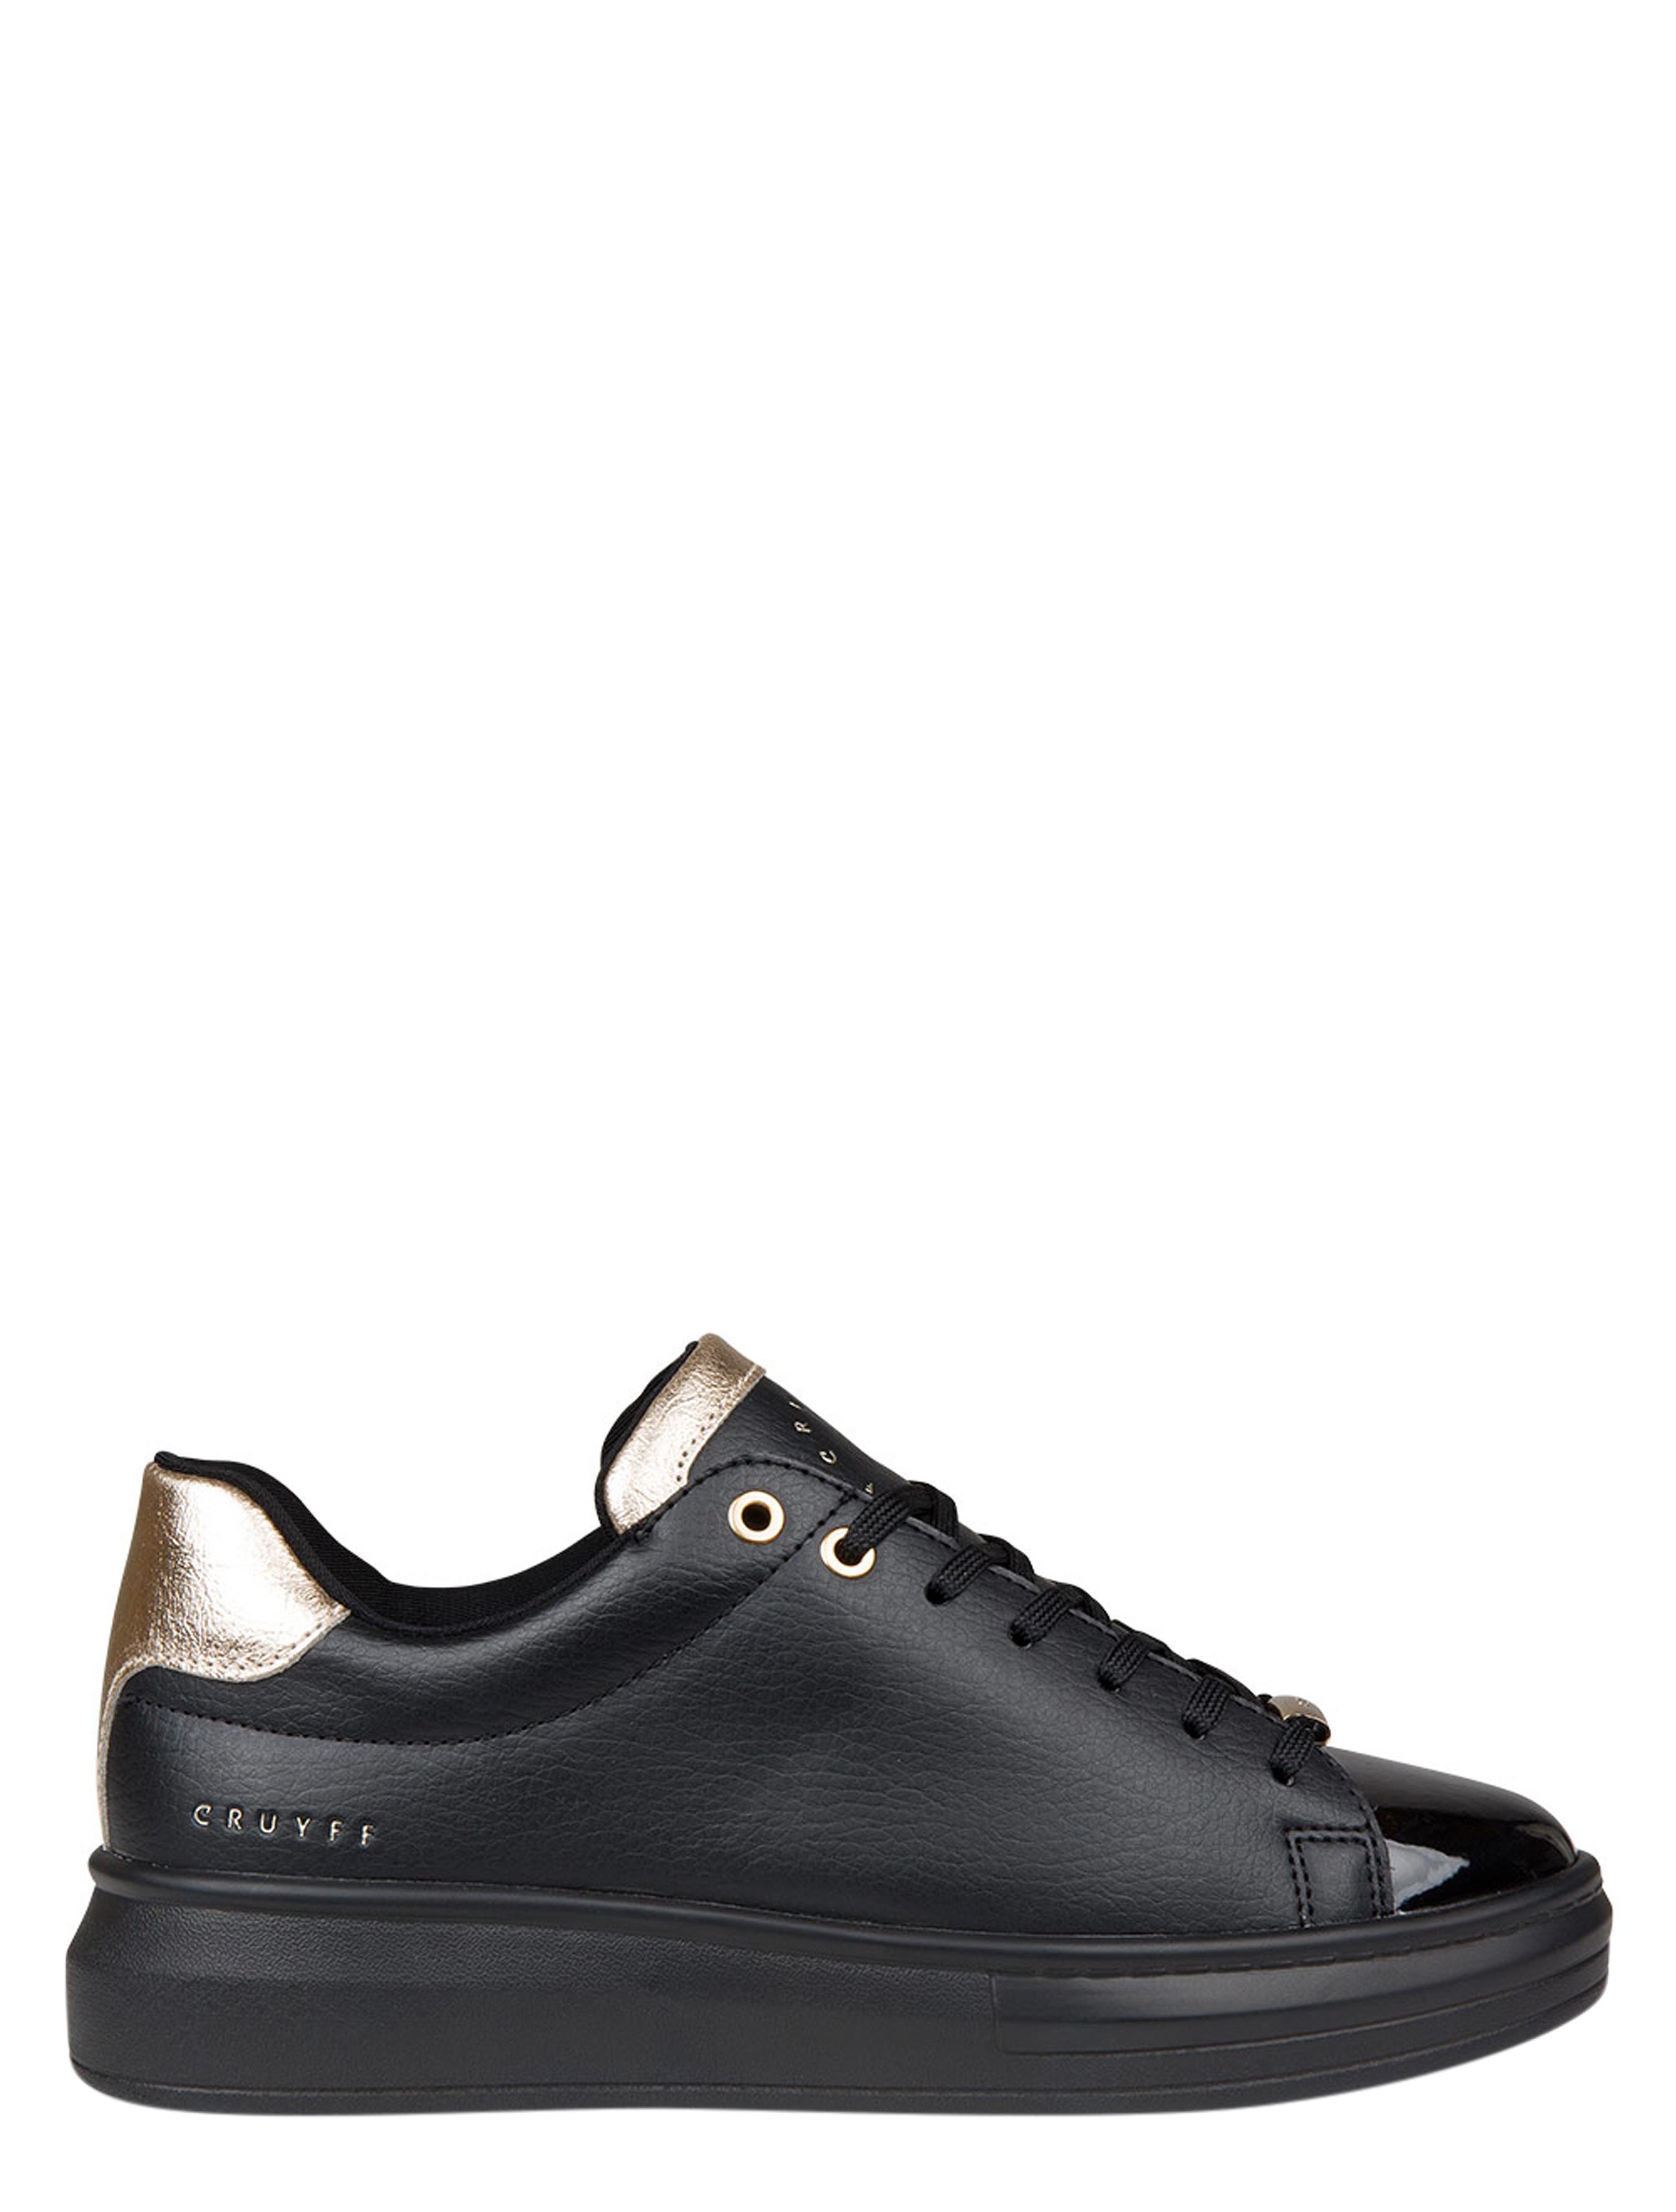 Cruyff Pace Black Gold Platform sneakers